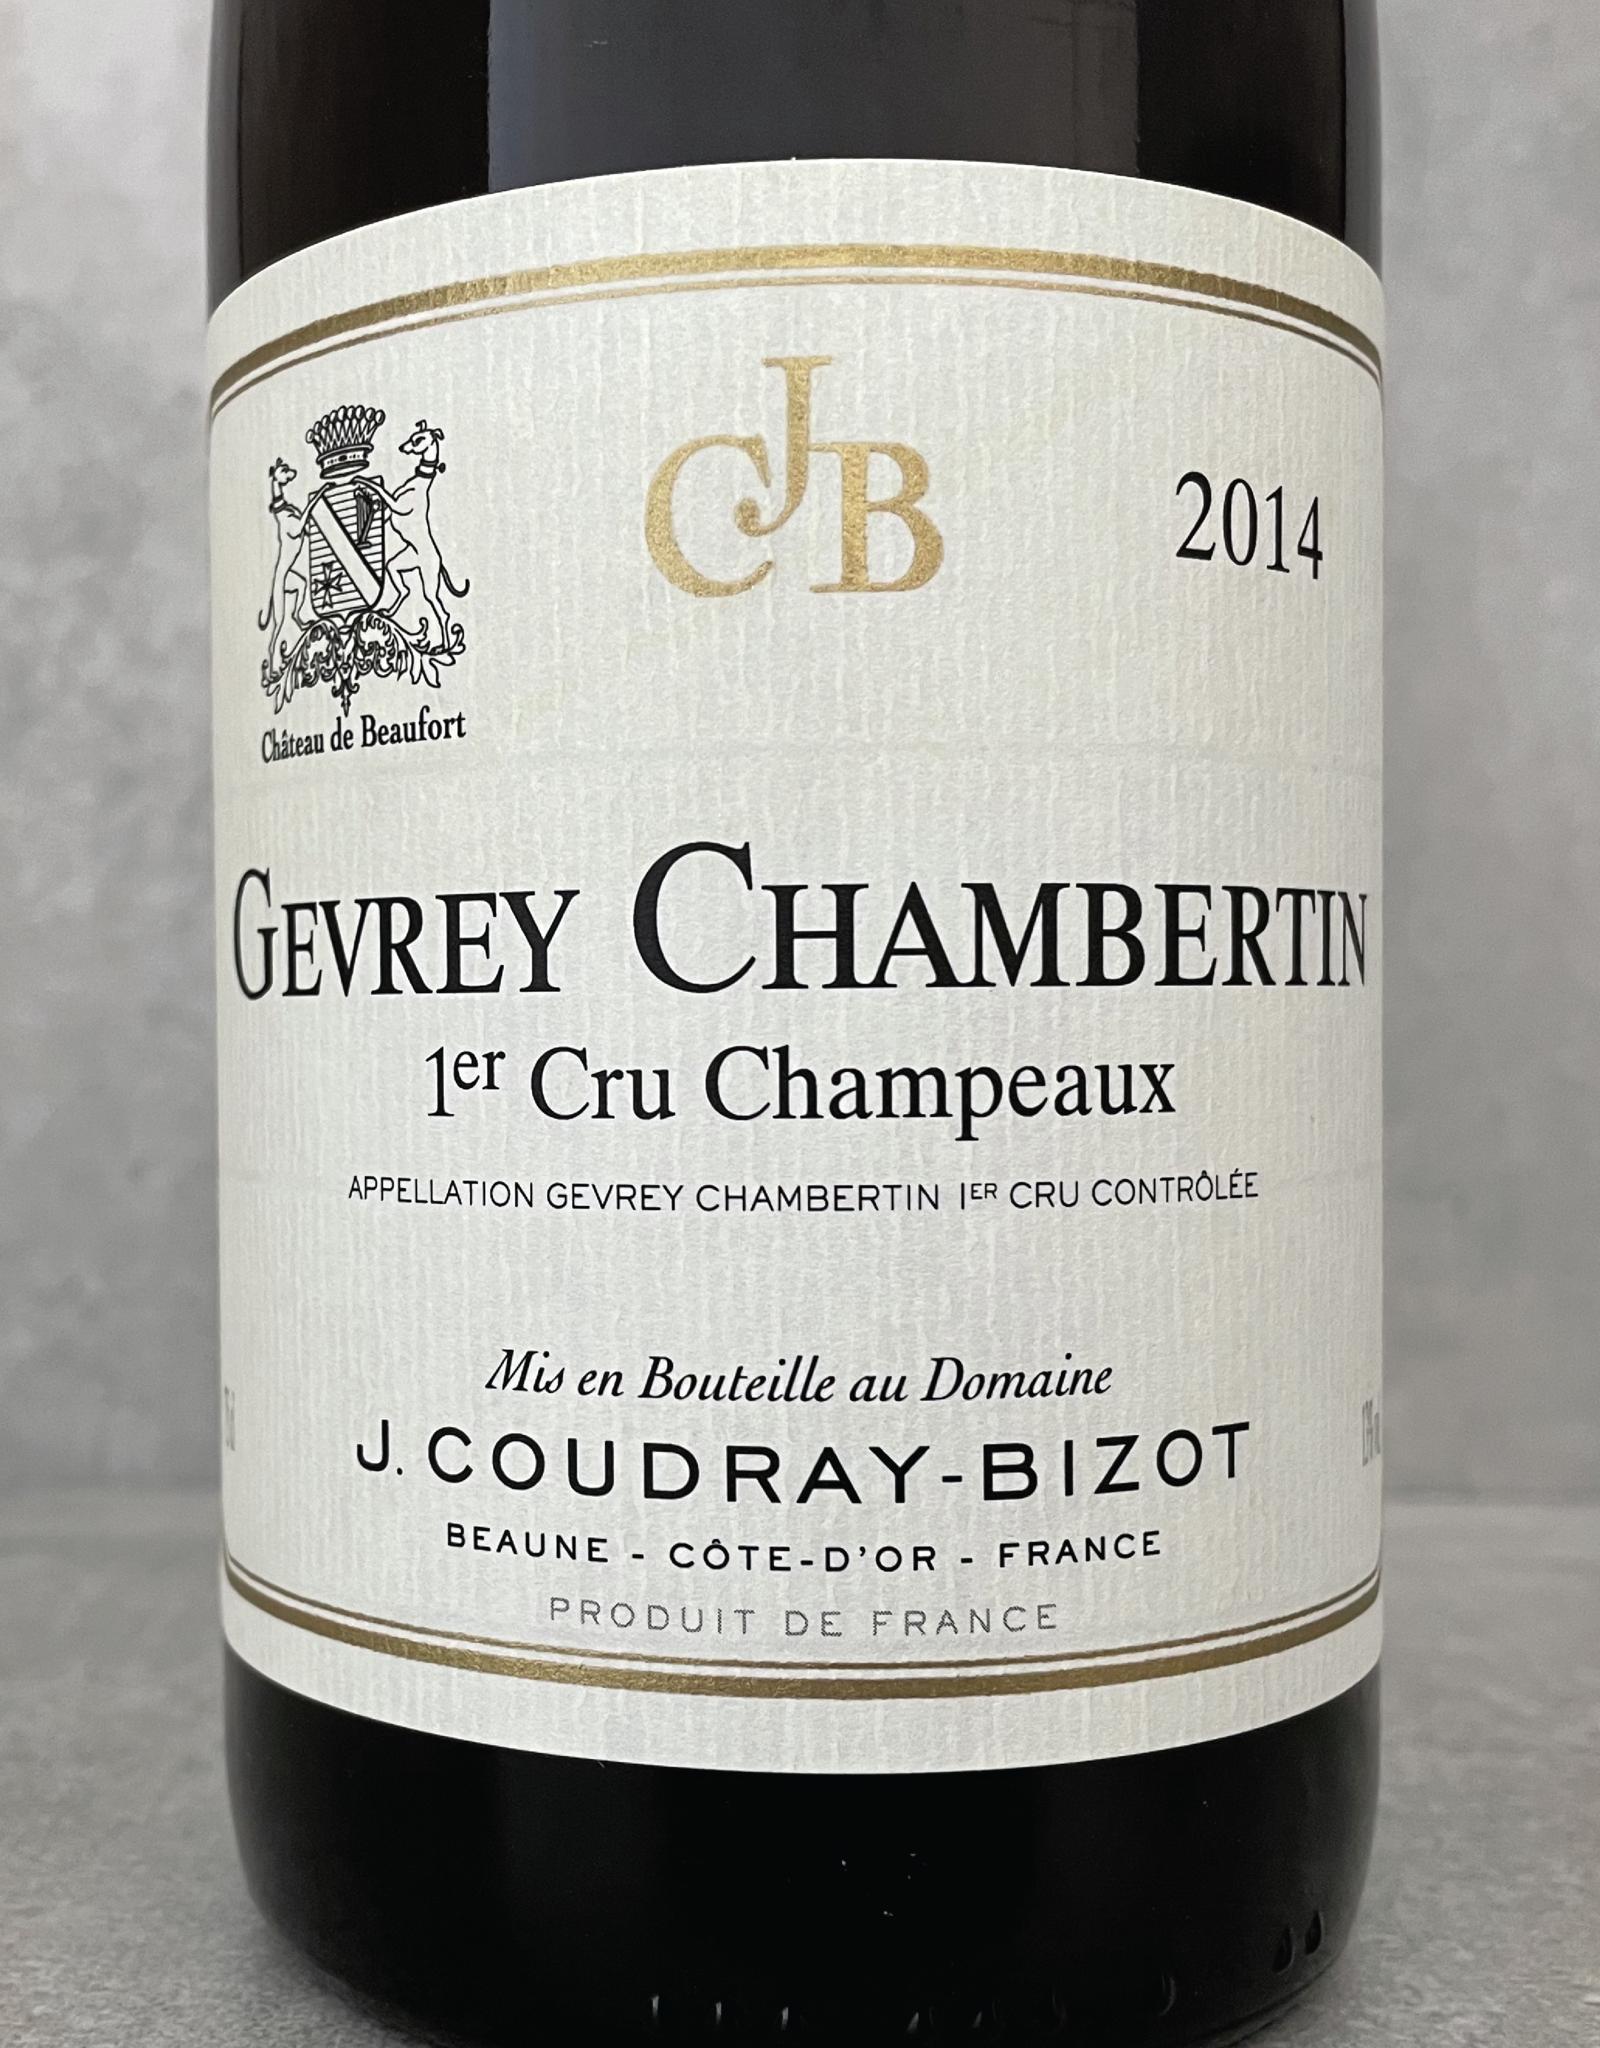 Domaine Coudray-Bizot Gevrey Chambertin 1er Cru Champeaux 2013